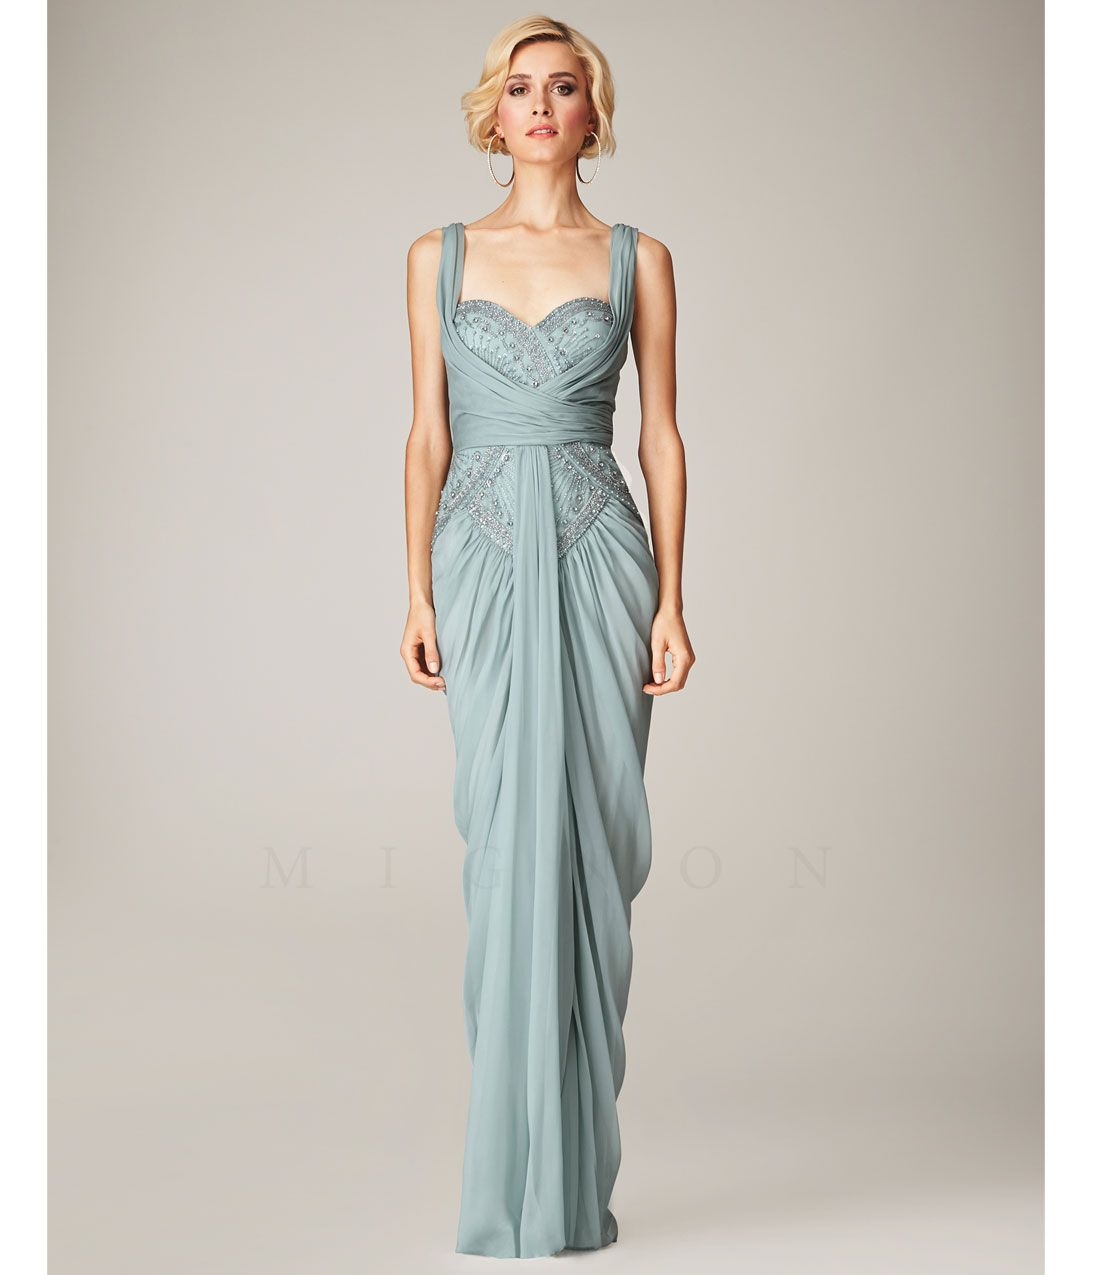 S formal dresses show laura pinterest vestidos vestidos